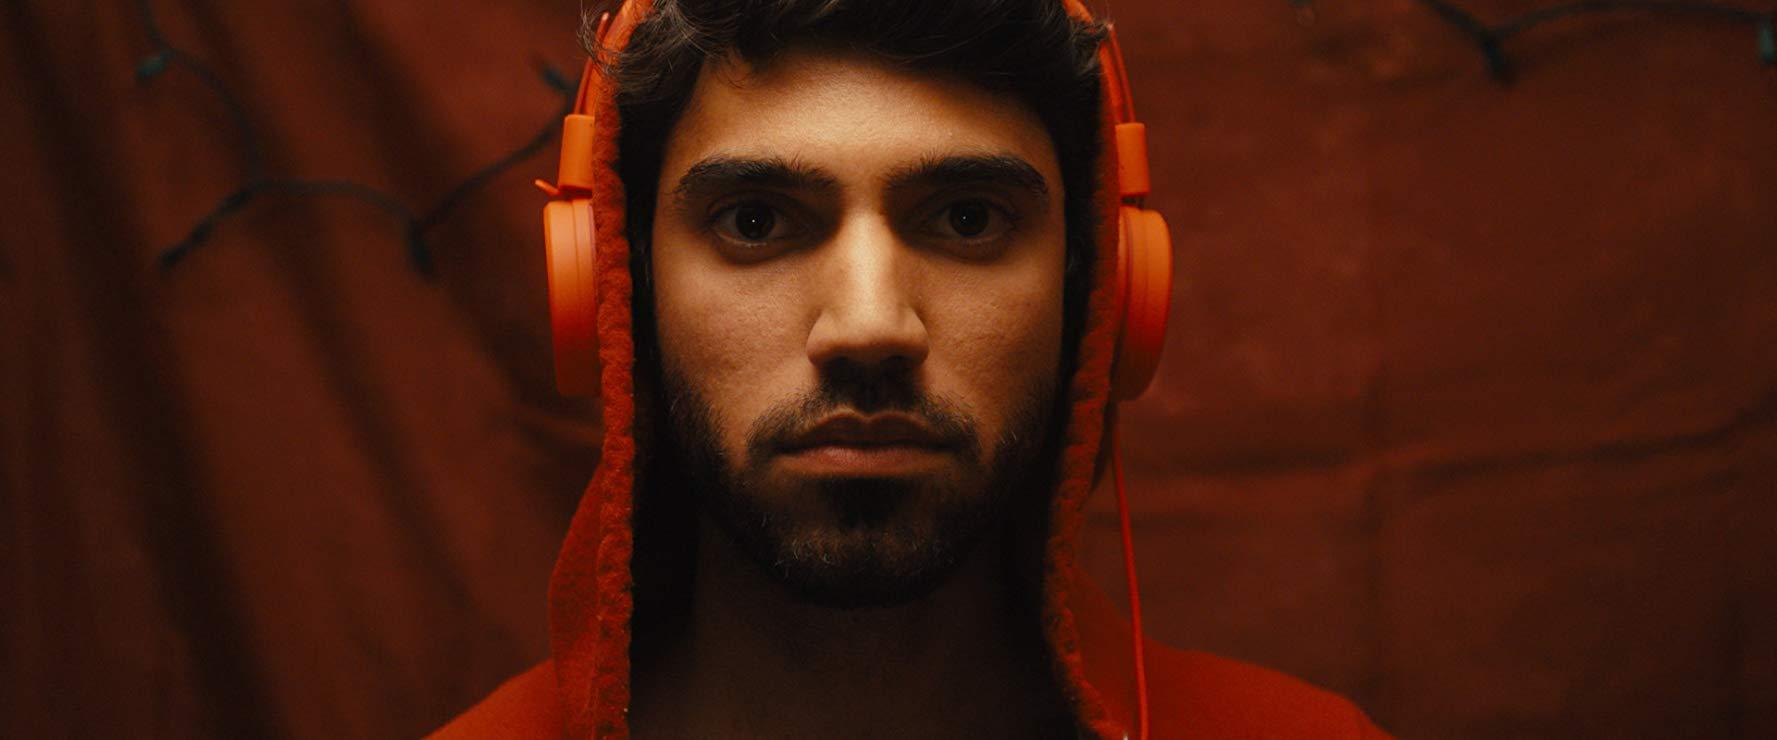 "Omar Maskati as ""Derek 'Milkshake' Qamar"" in Revenge Tour (2018)"